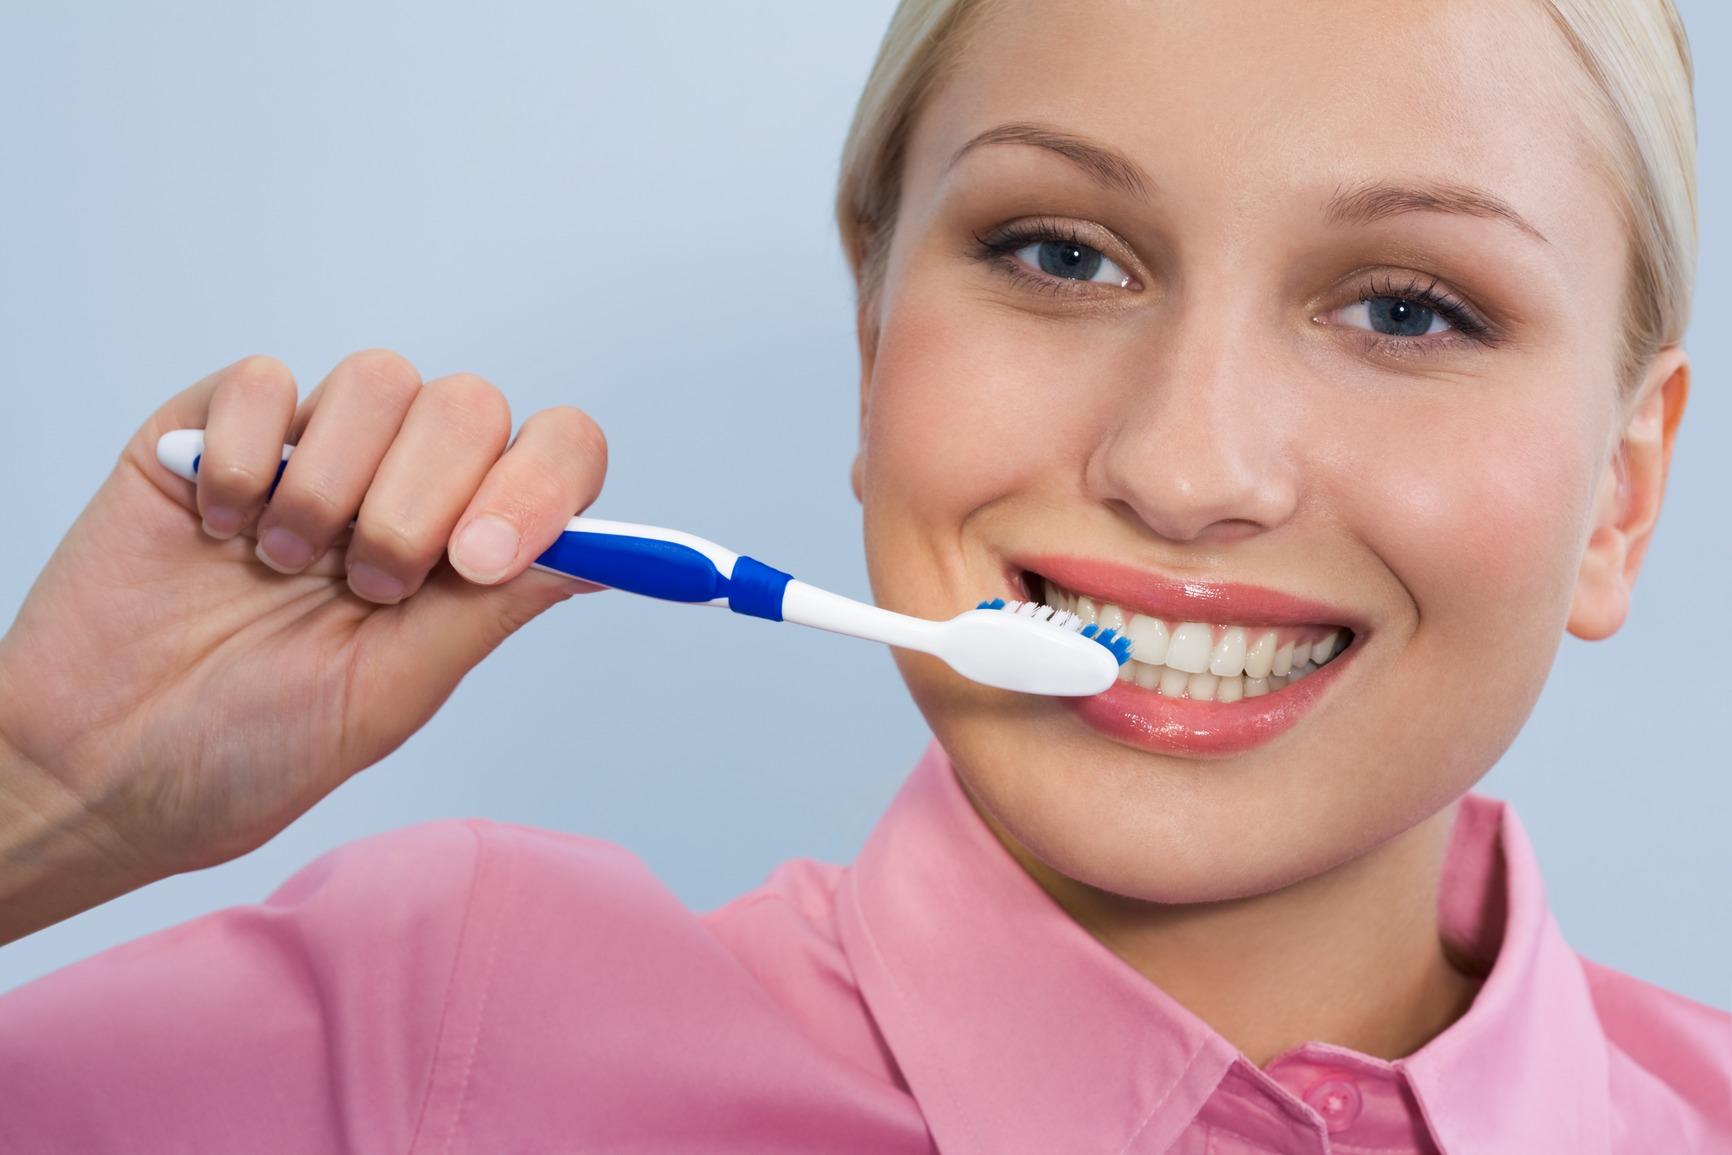 Brush teeth, stay healthy